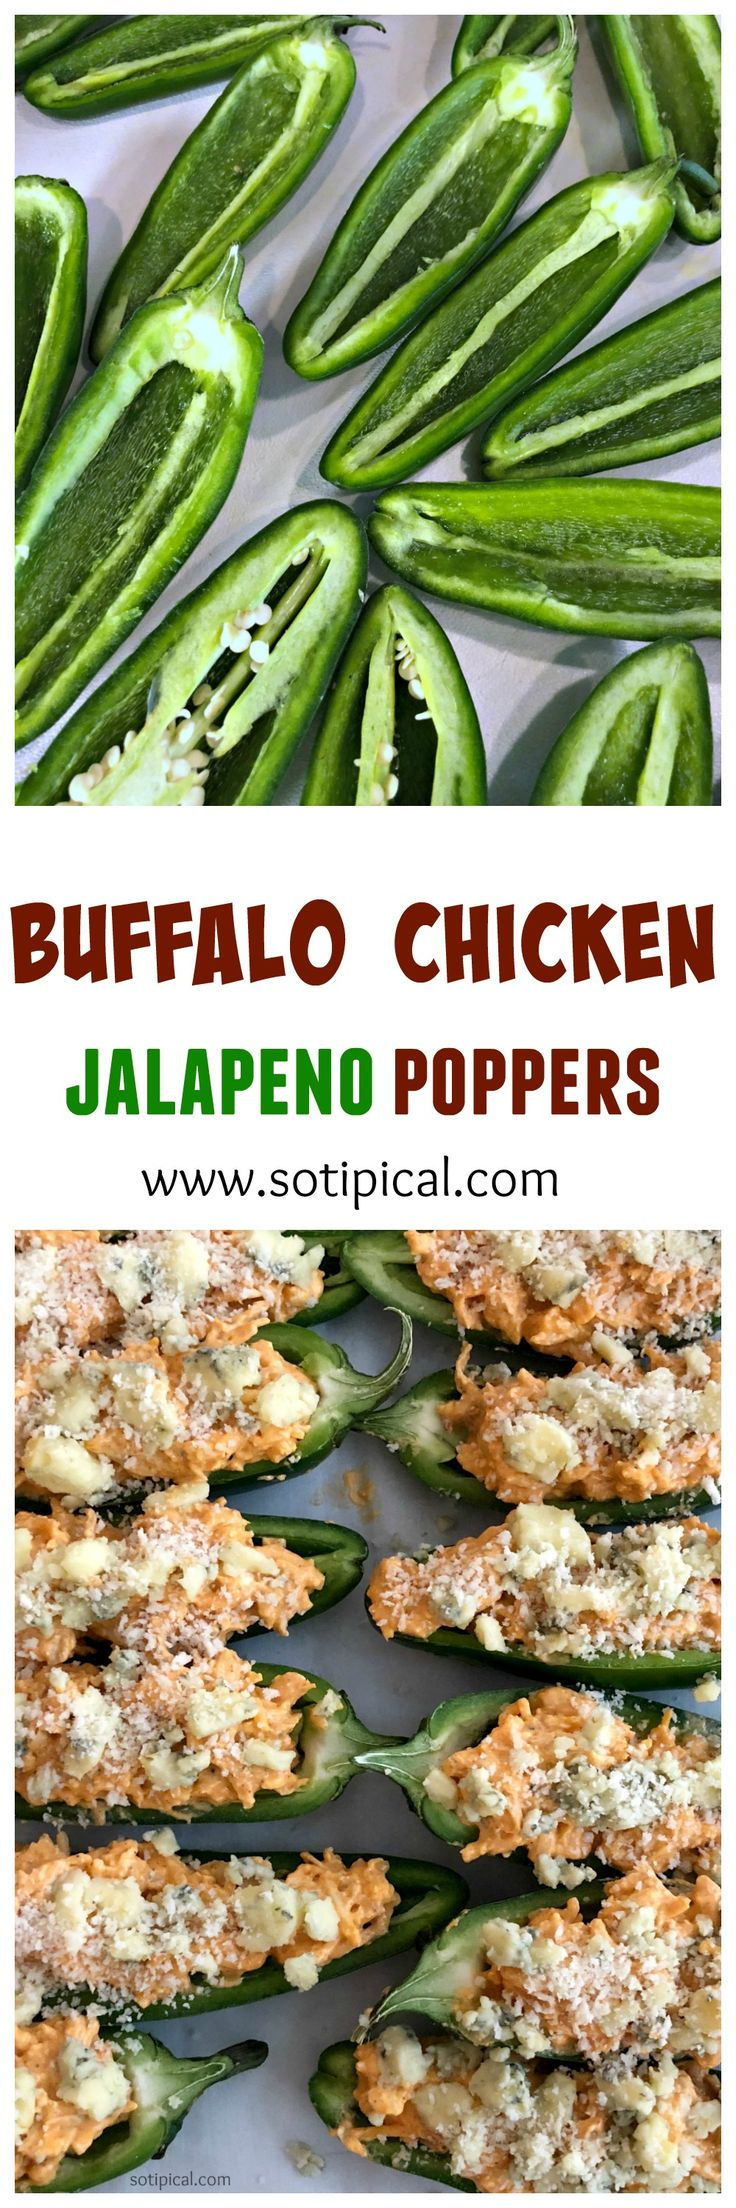 Buffalo Chicken Jalapeno Poppers - So TIPical Me #ad @salemvilleblue #salemville